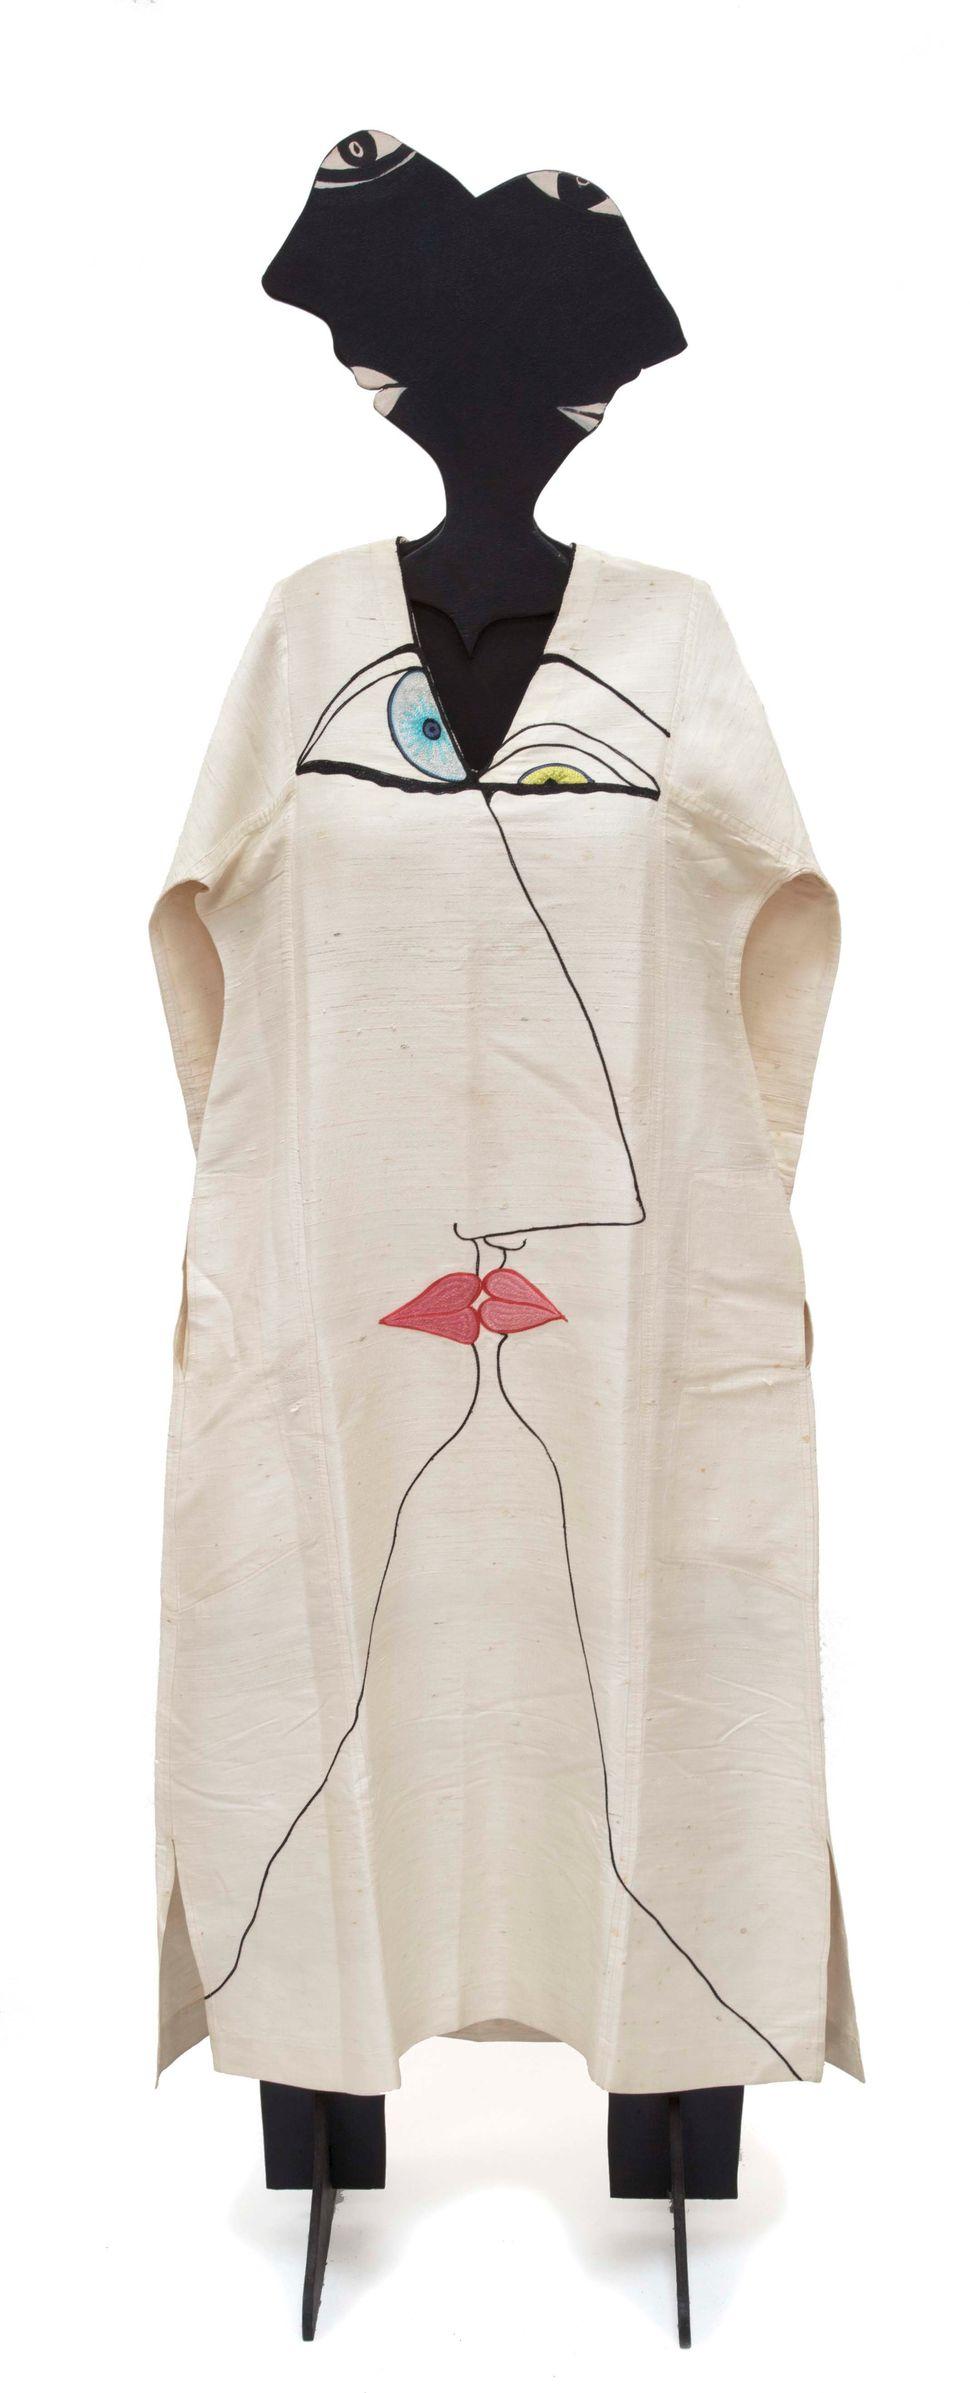 Tete-a-tete(dress #3), 1971, thread on fabric.